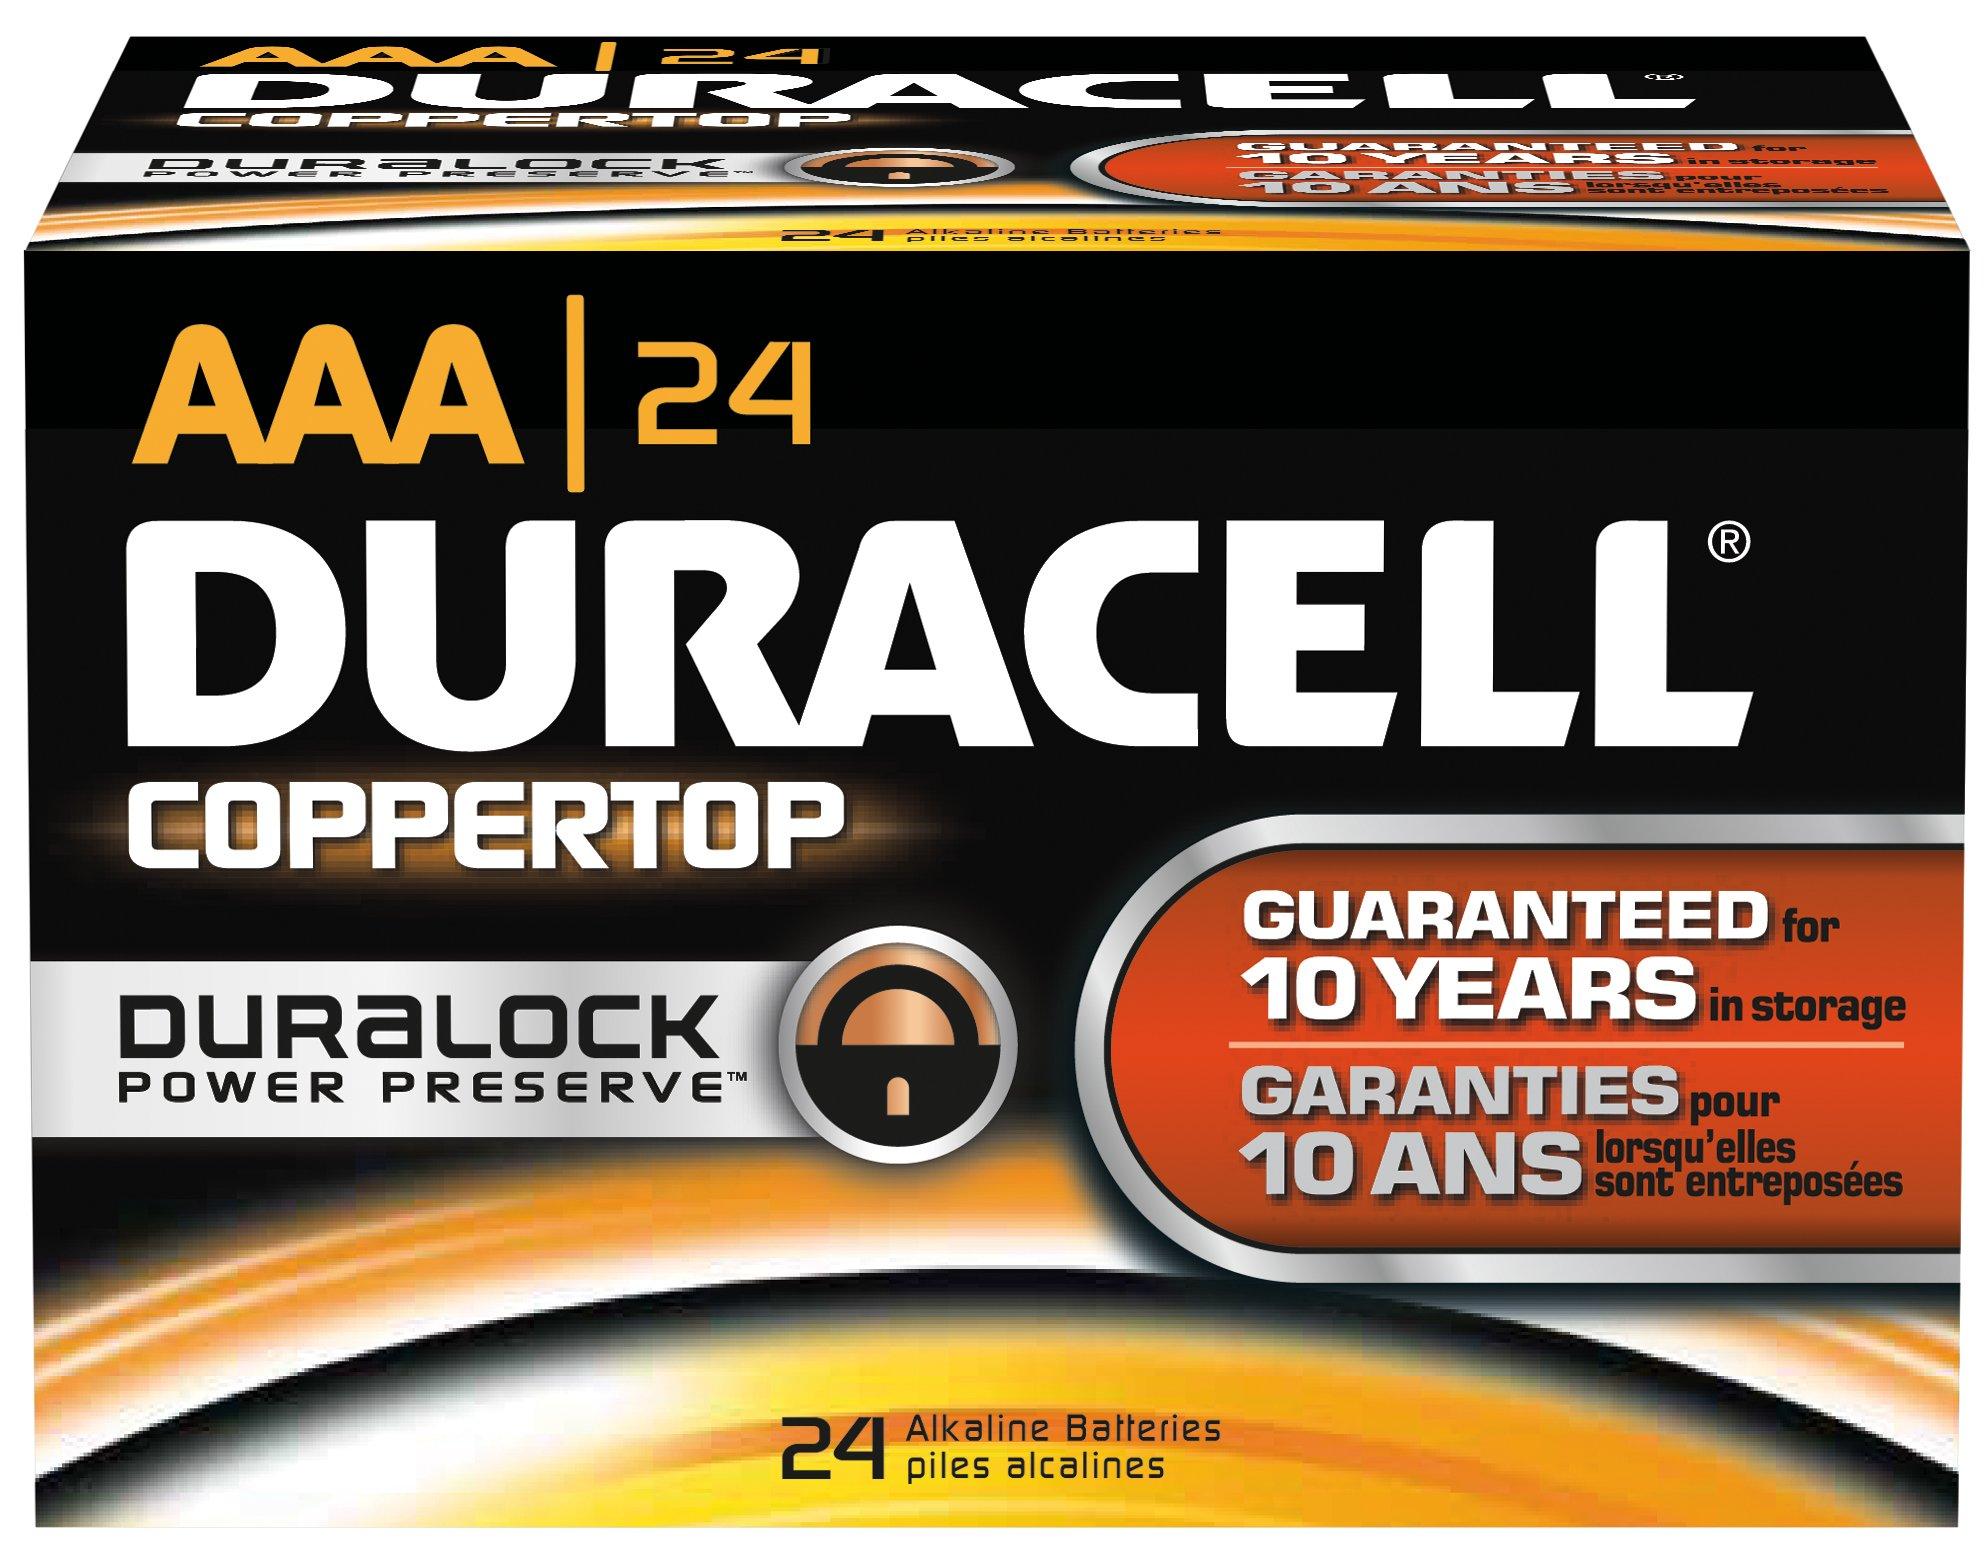 Procter & Gamble DURMN2400BKD Duracell Coppertop General Purpose Battery